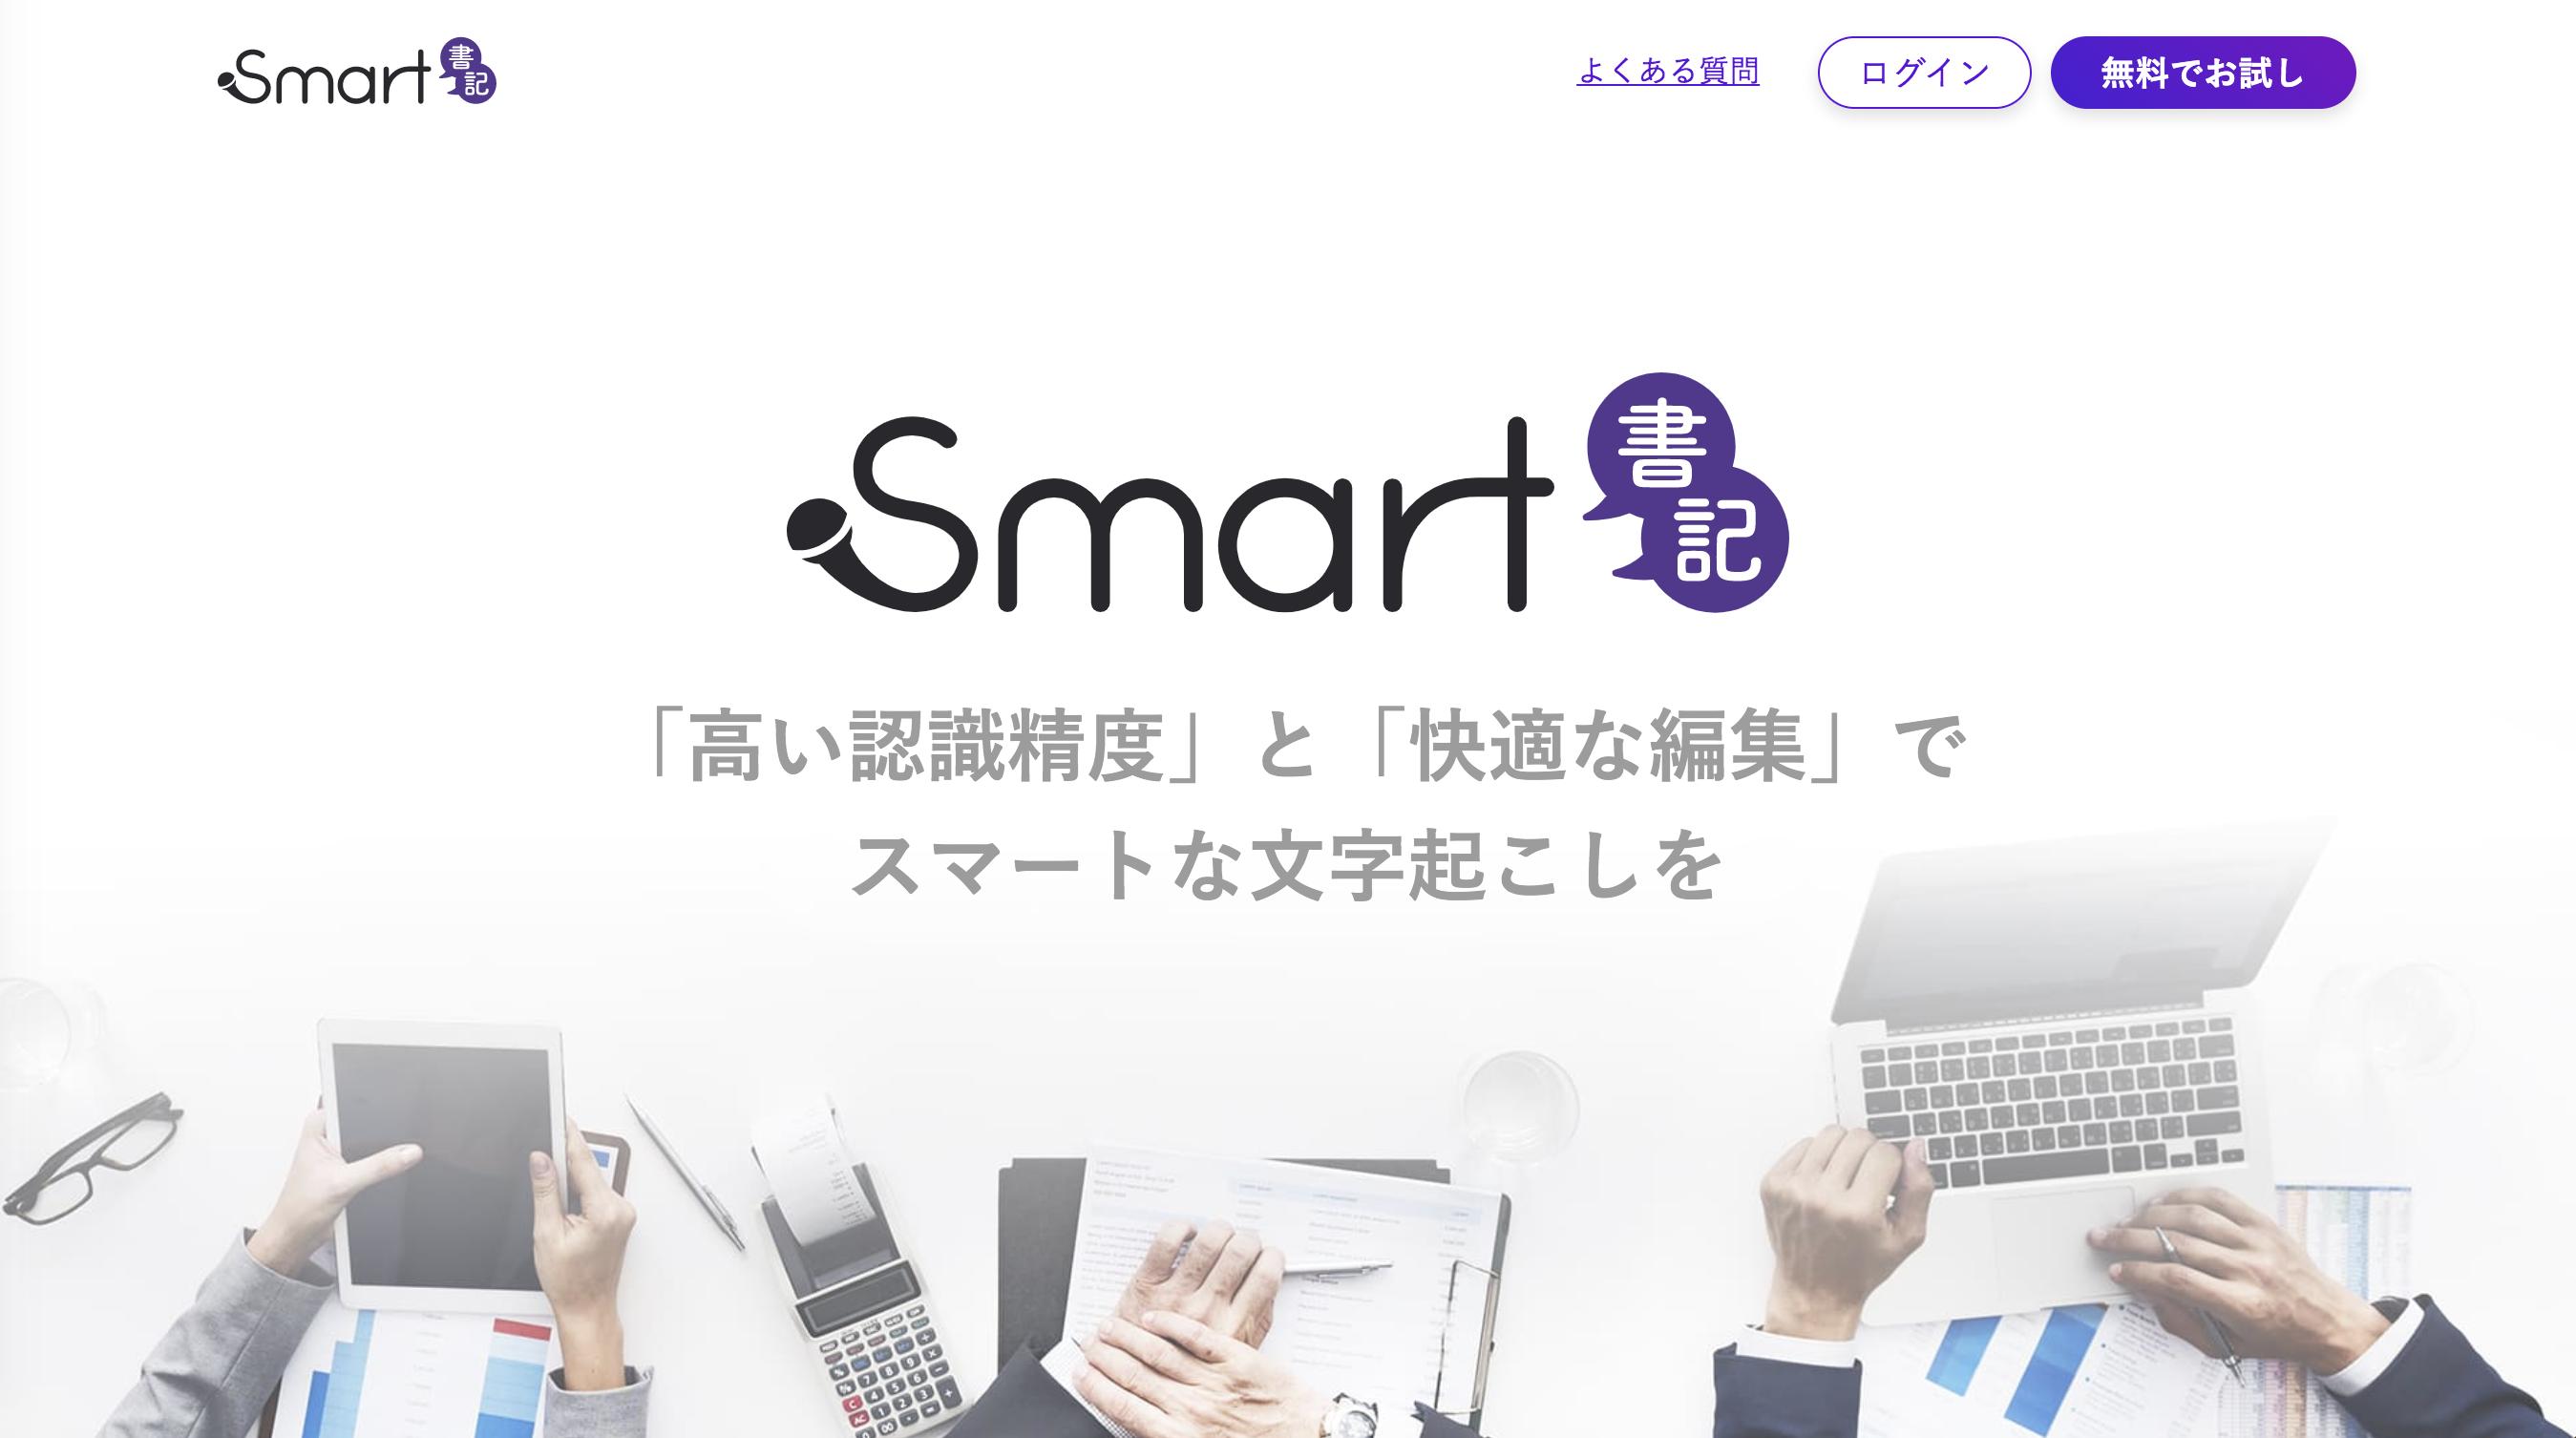 ferret_smartshoki.png